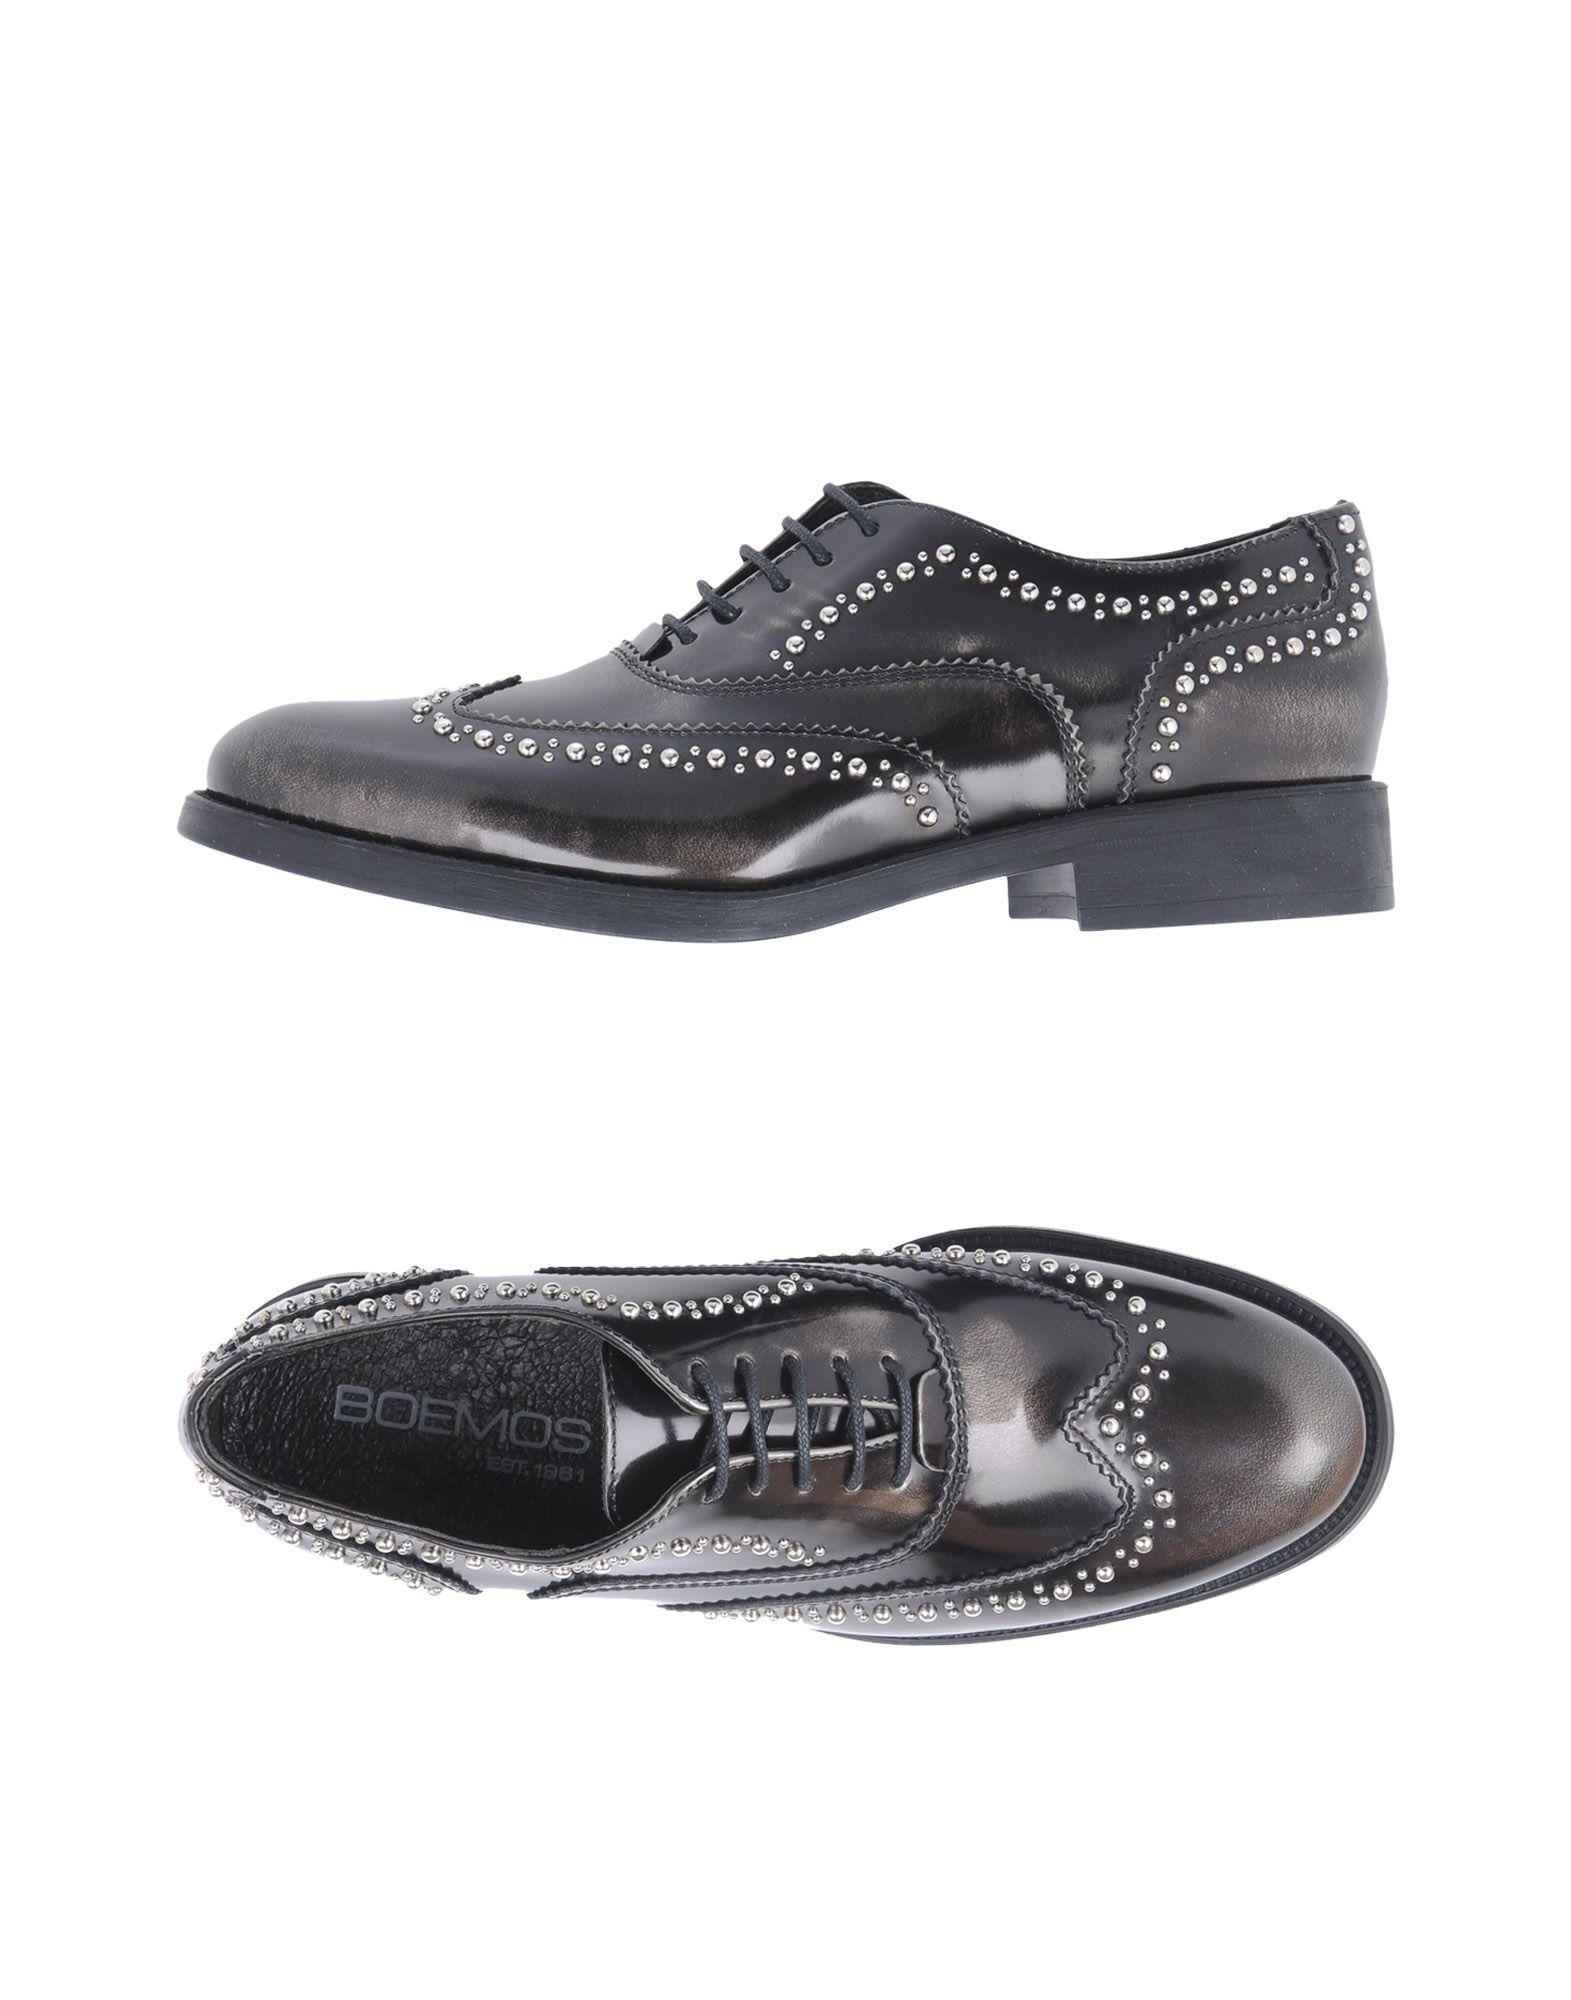 Boemos Schnürschuhe Damen  11331276PK Gute Qualität beliebte Schuhe